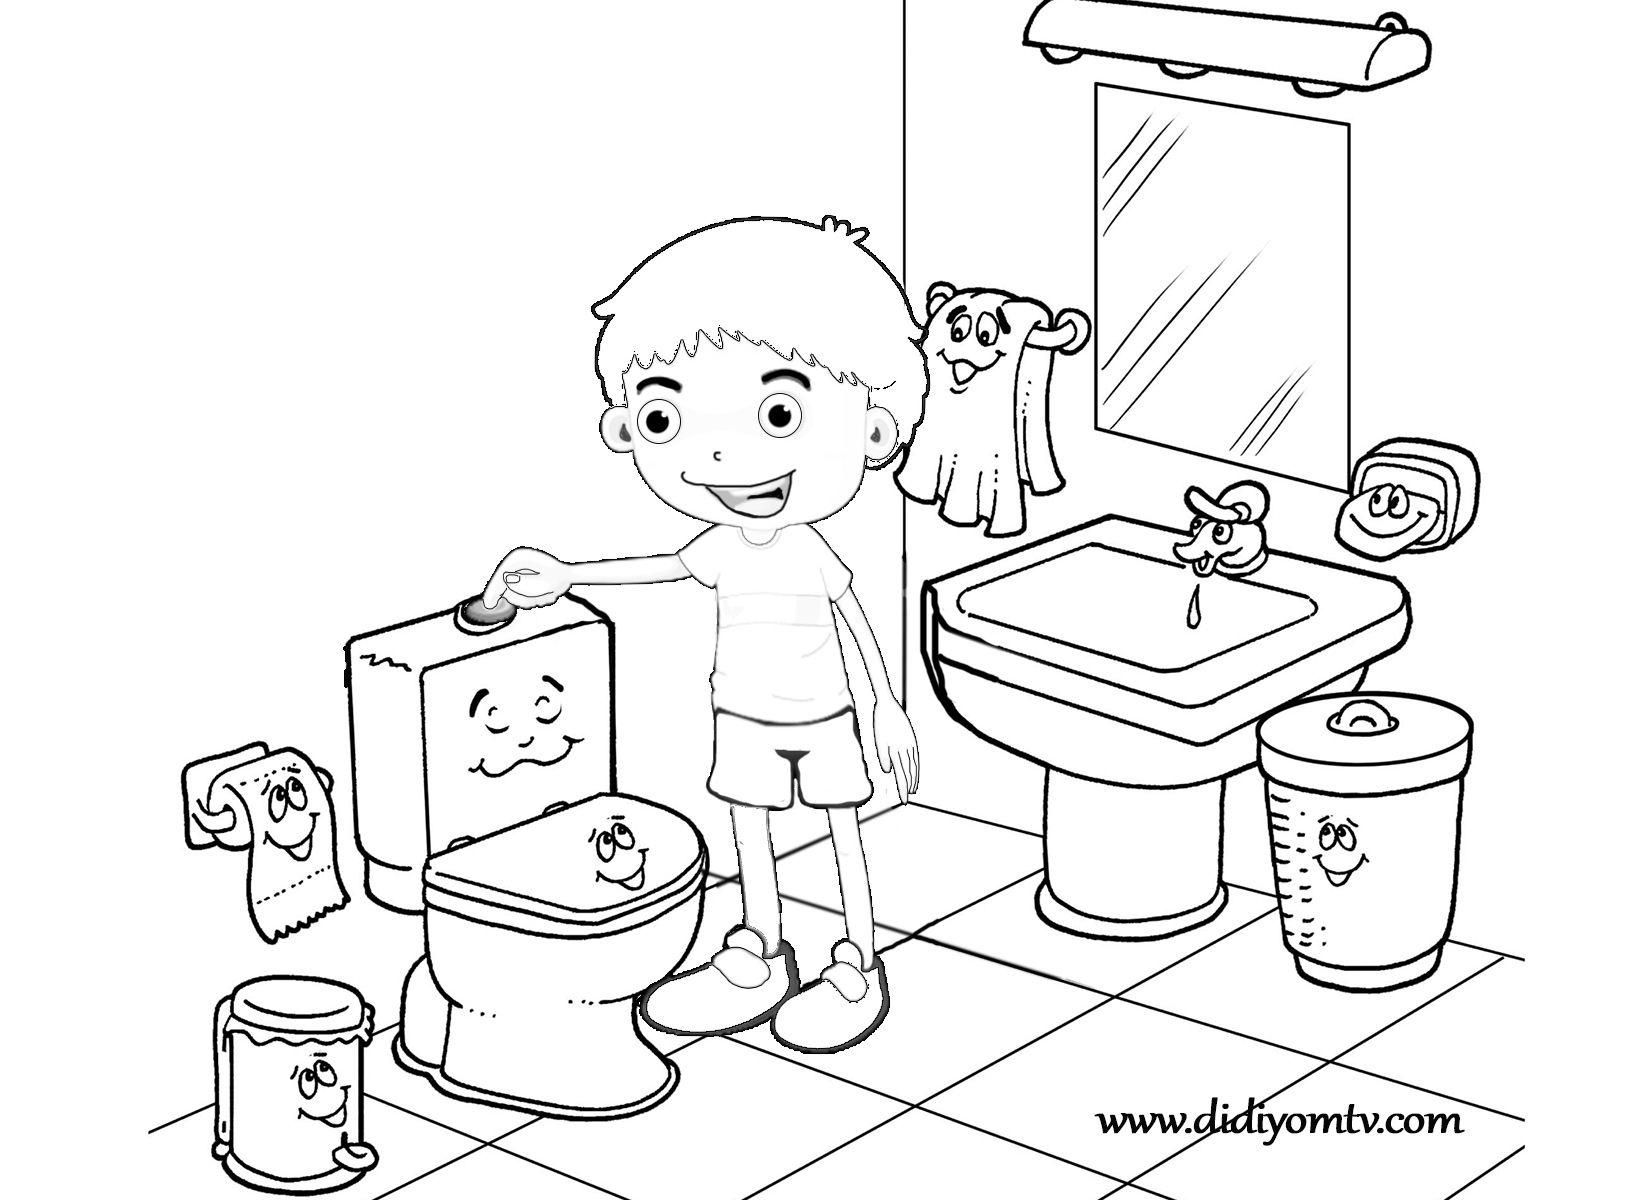 Tuvalet Adabi Boyama Sayfasi Boyama Sayfalari